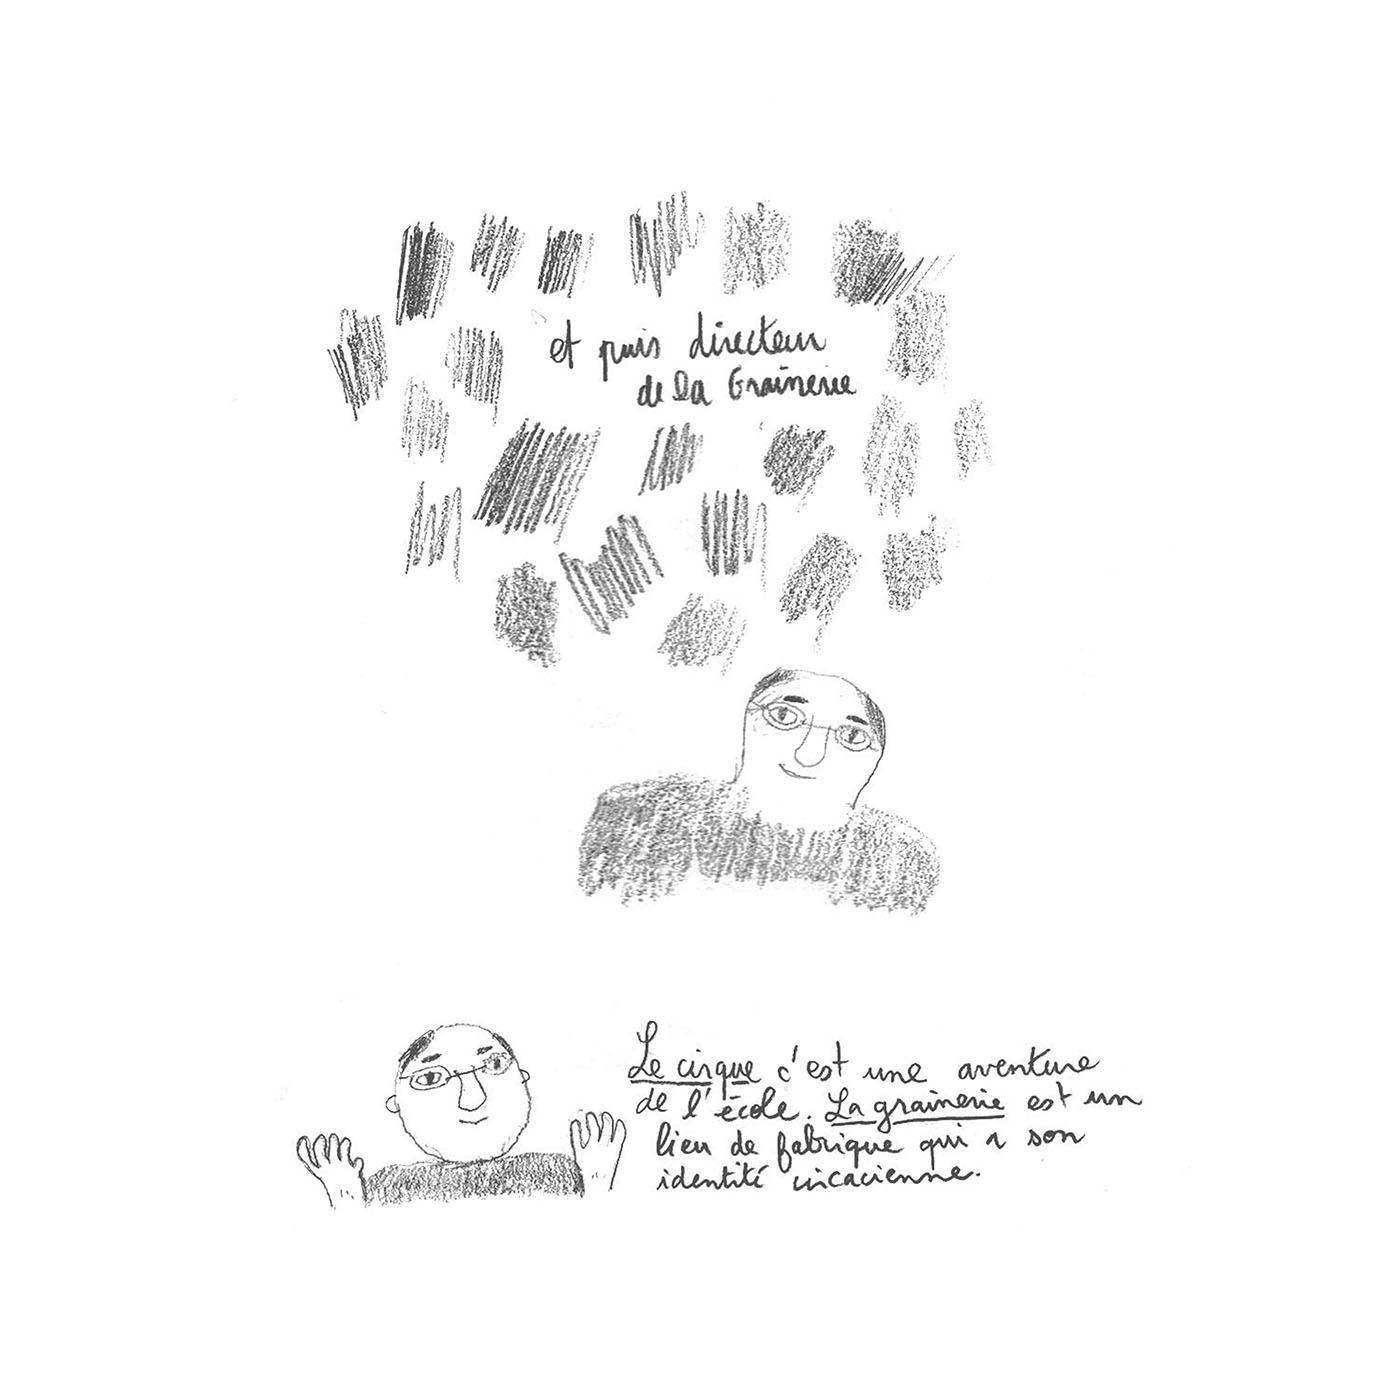 Serge Borras Reveil Creatif illustration6